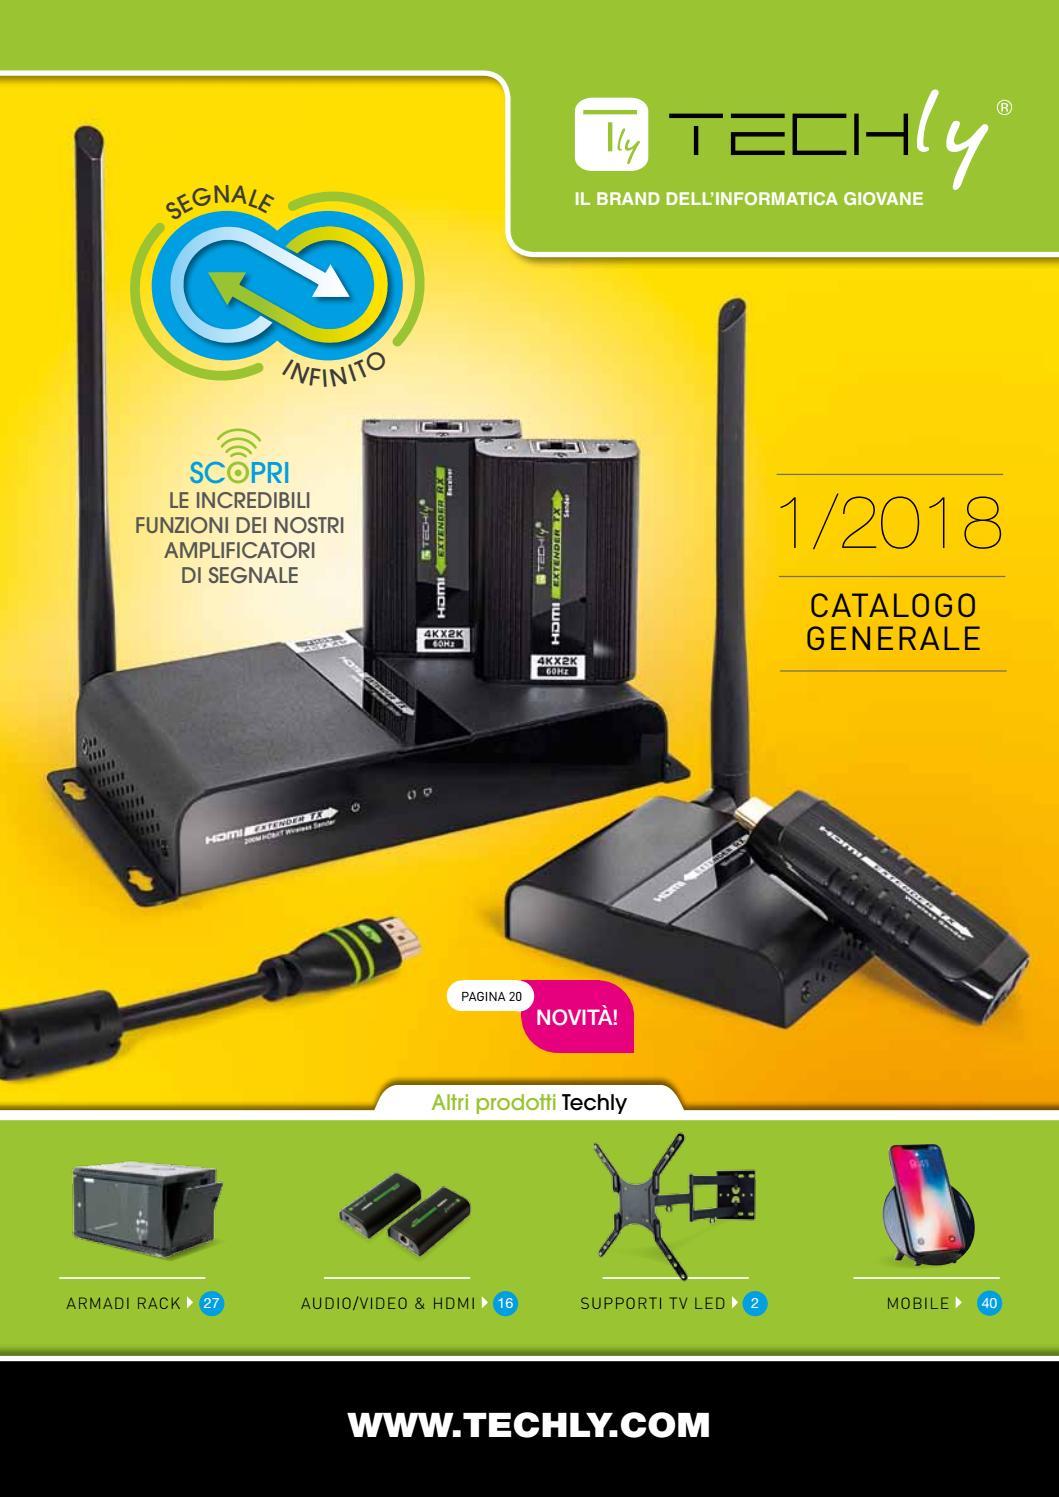 Tavolino Porta Pc Con Ventola Usb E Gambe Allungabili.Catalogo Techly 1 2018 By Ic Intracom Italia S P A Issuu